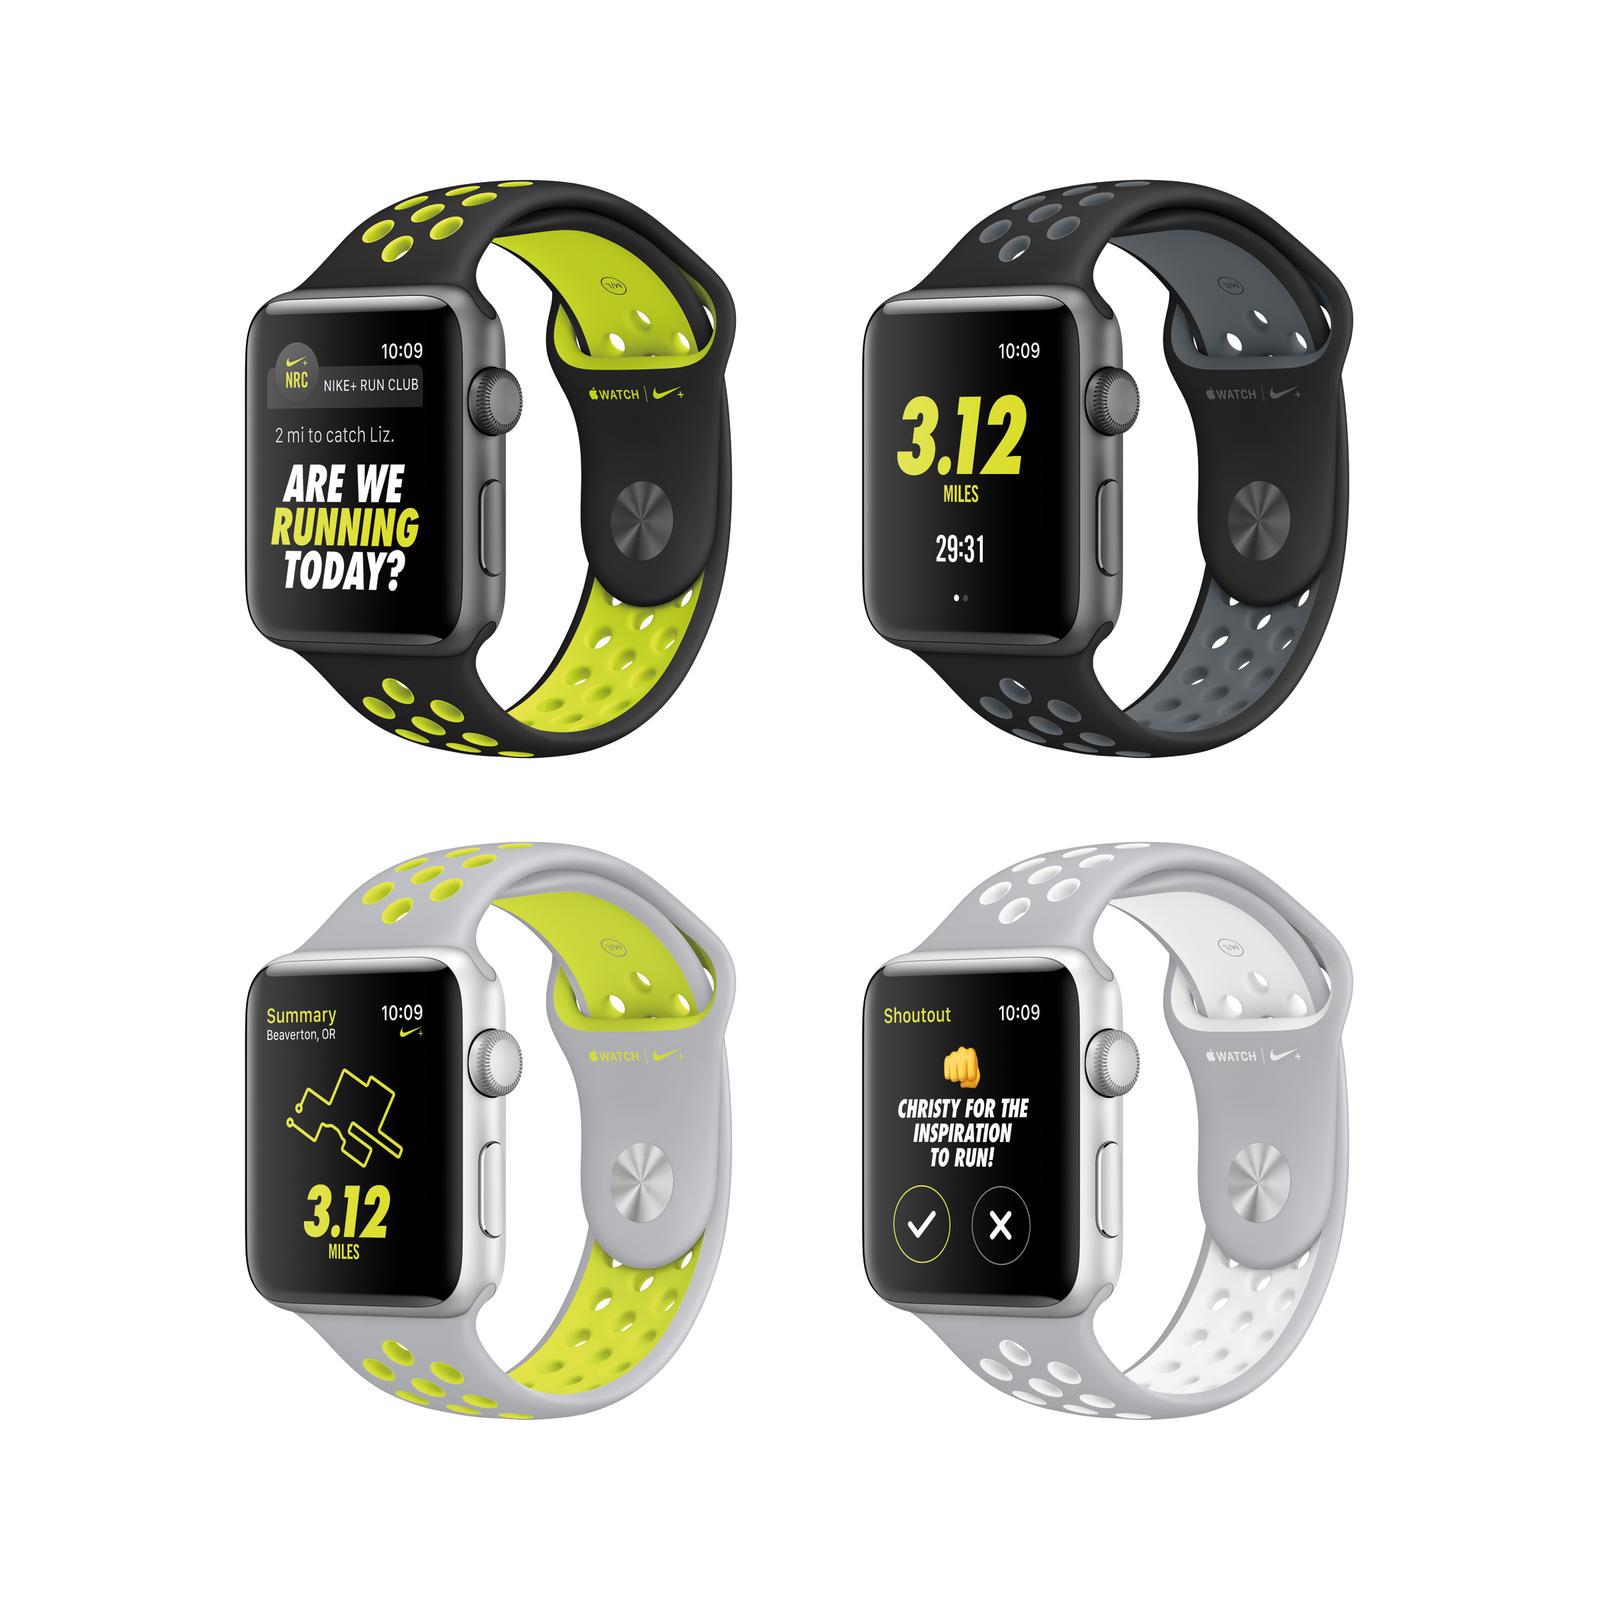 Smartwatch 3 nike running